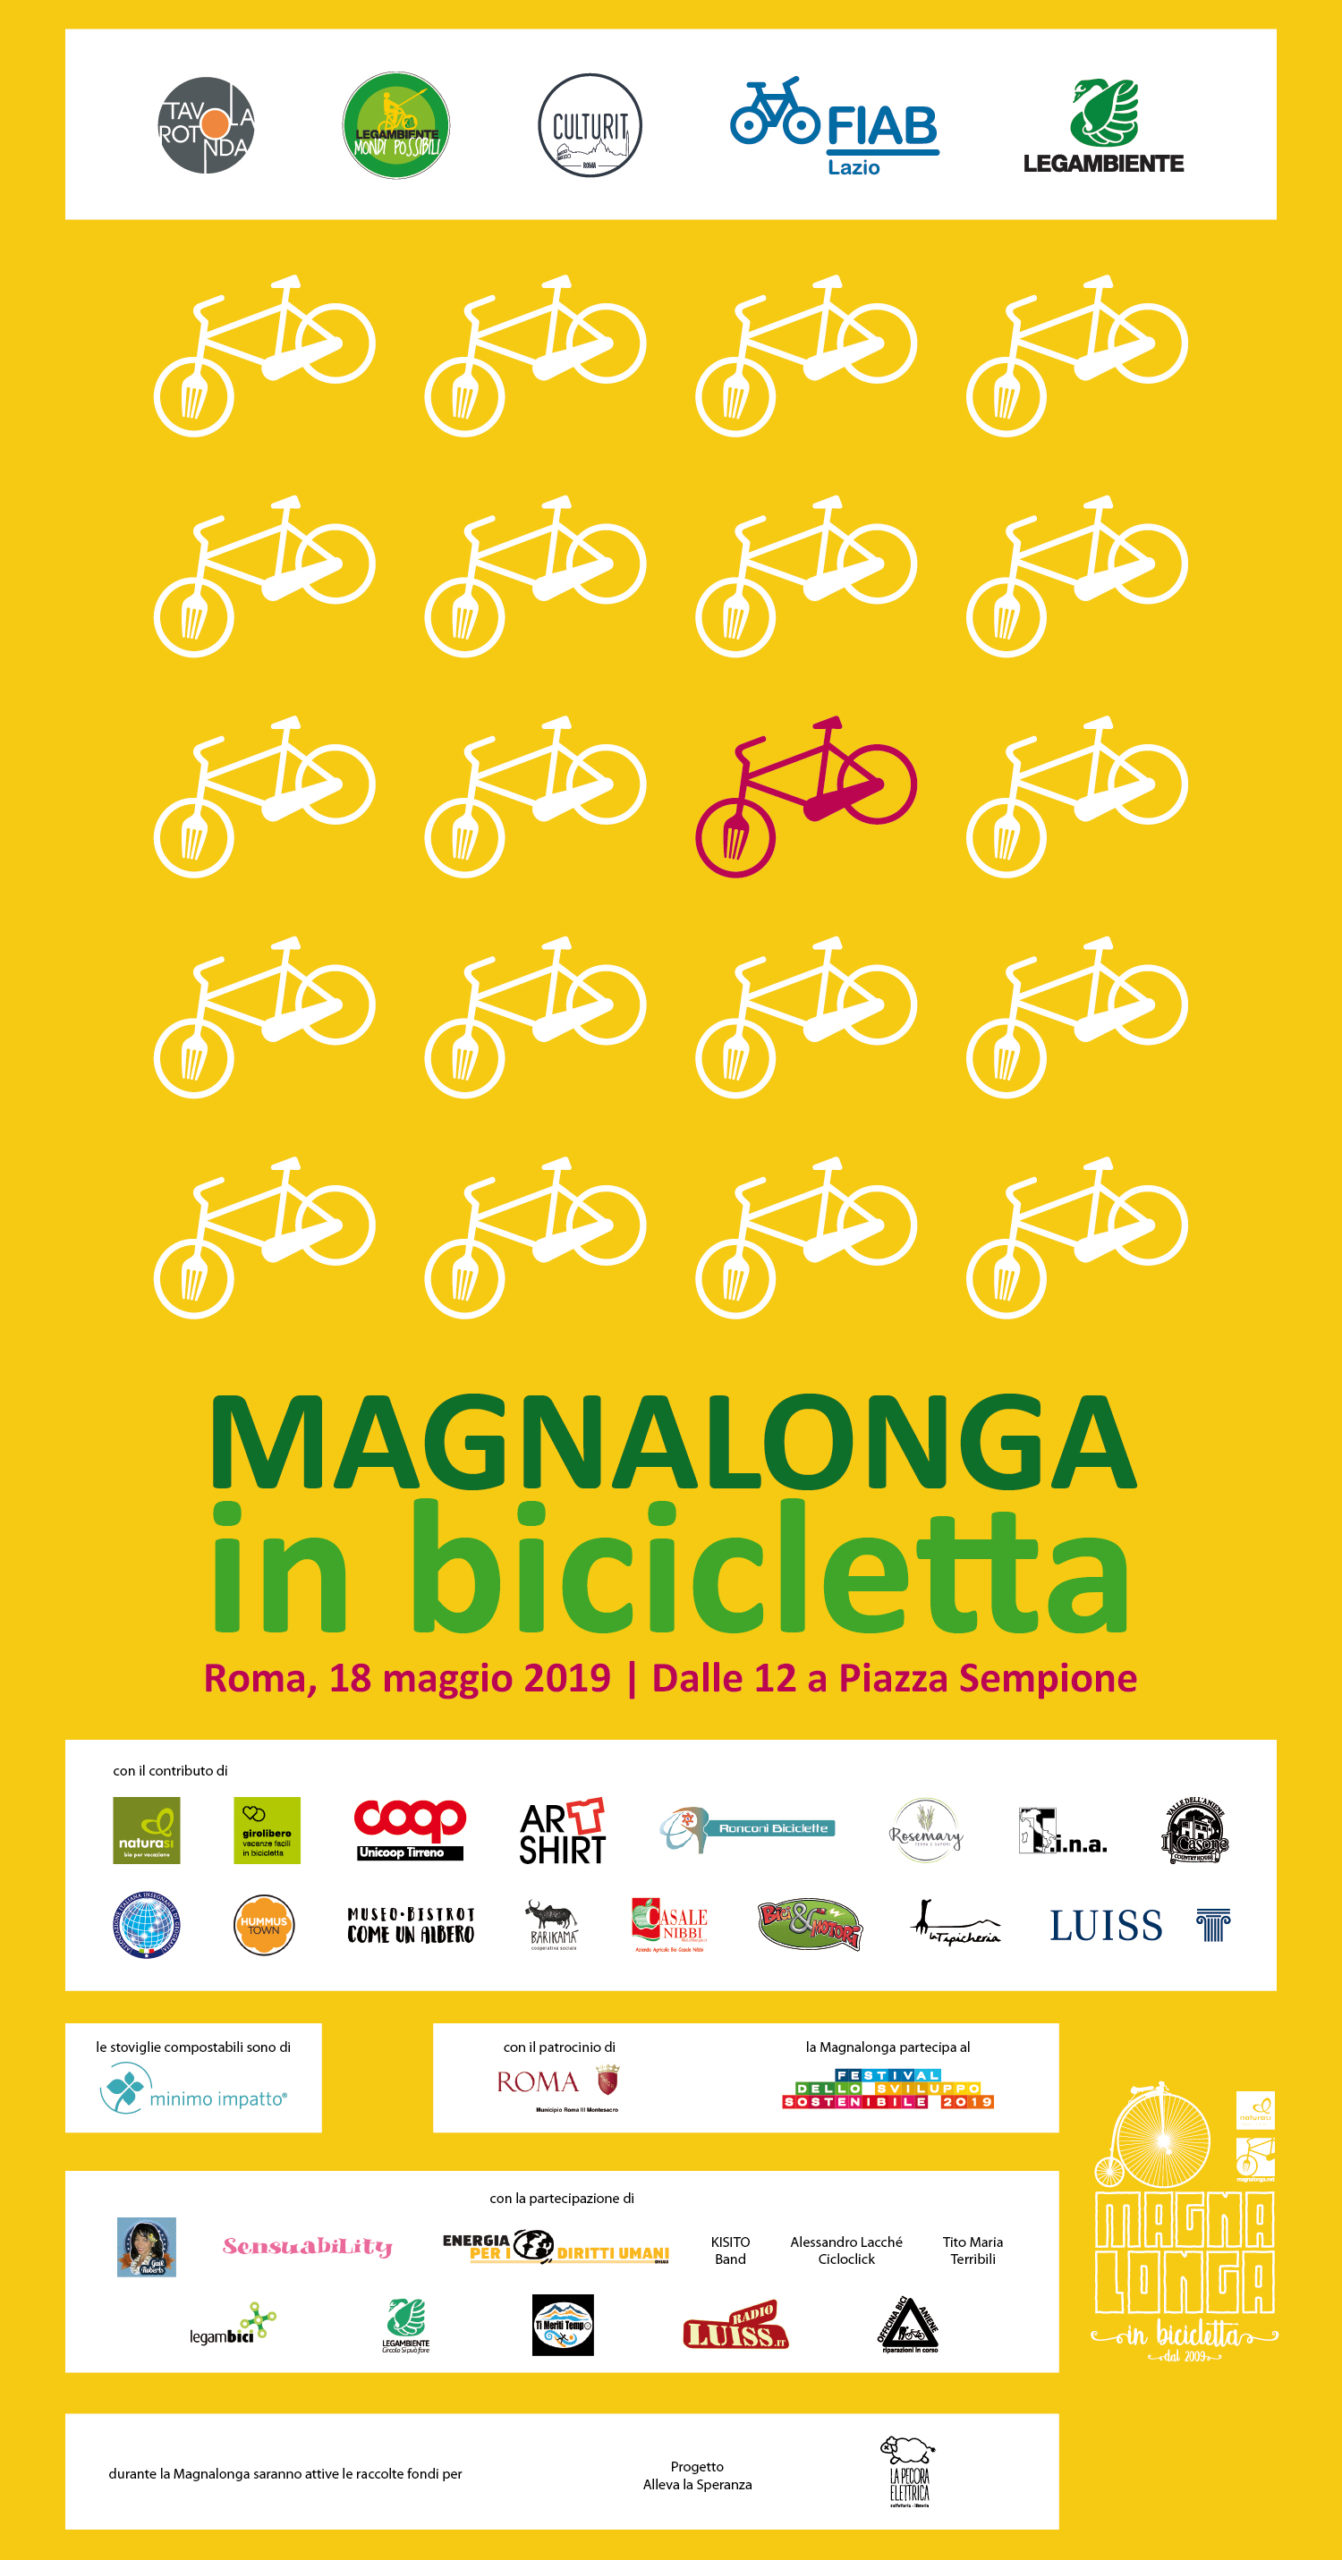 Magnalonga in bicicletta